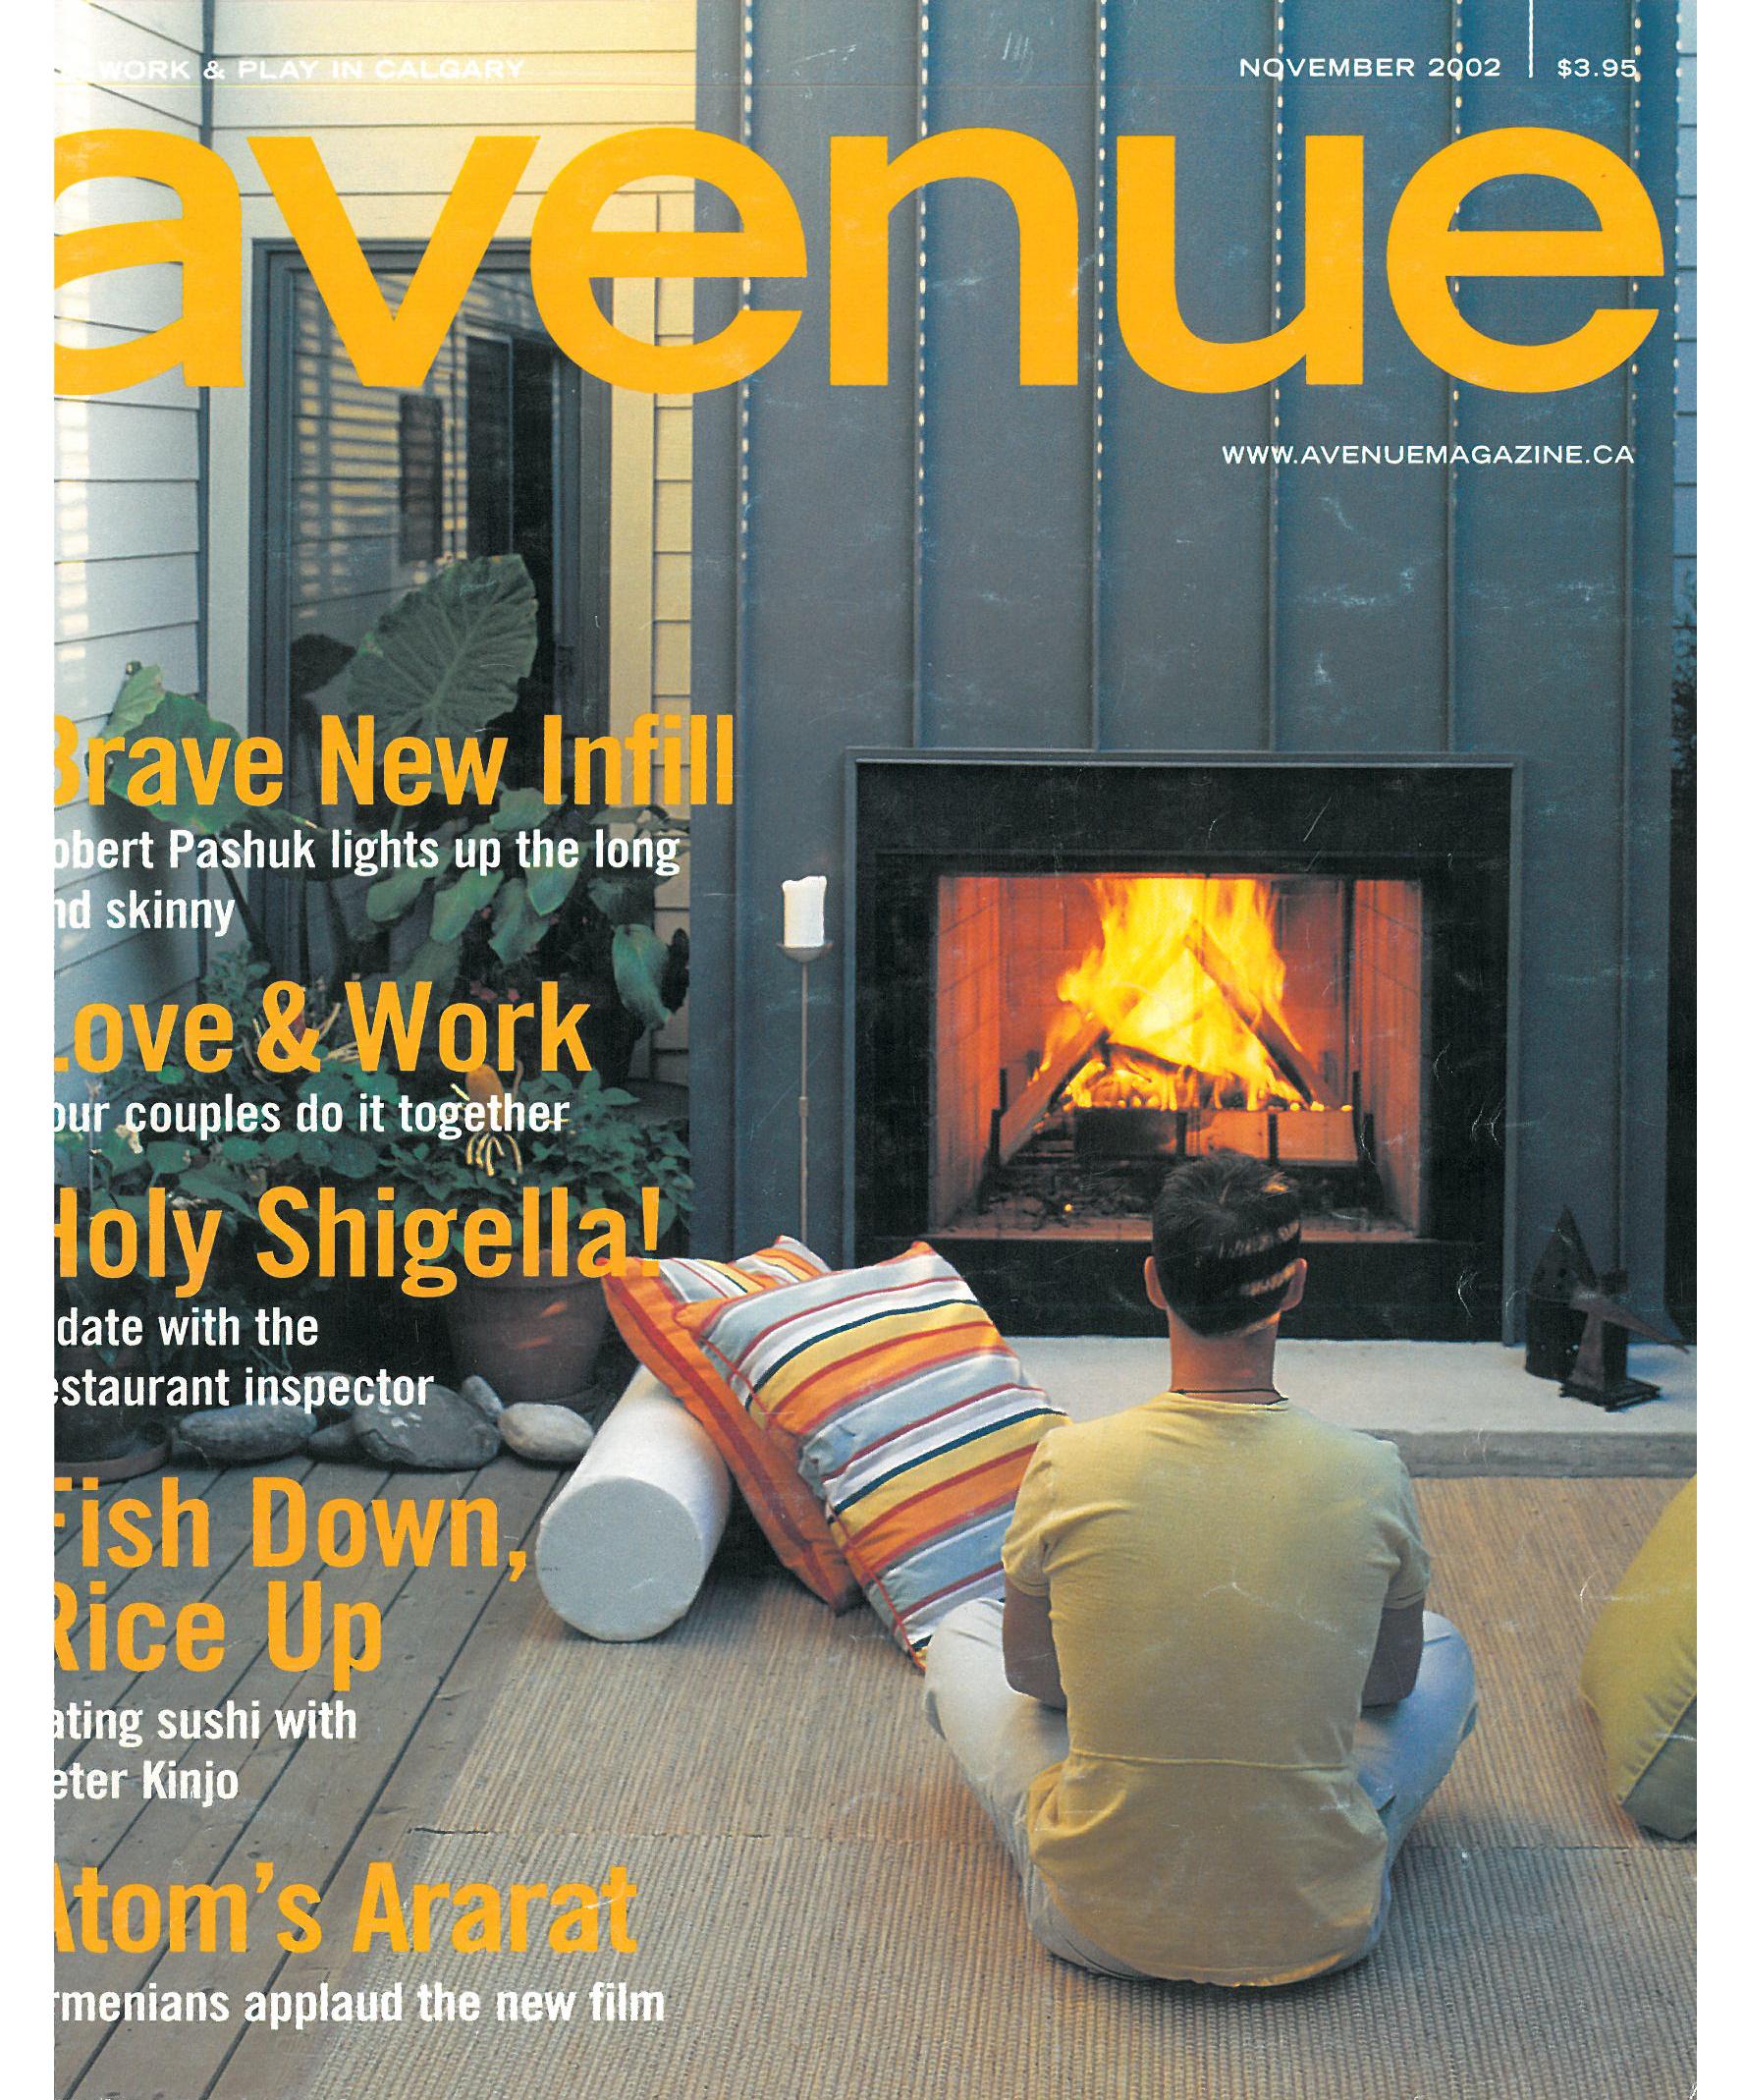 AvenueMagazine_November2002_Cover.png